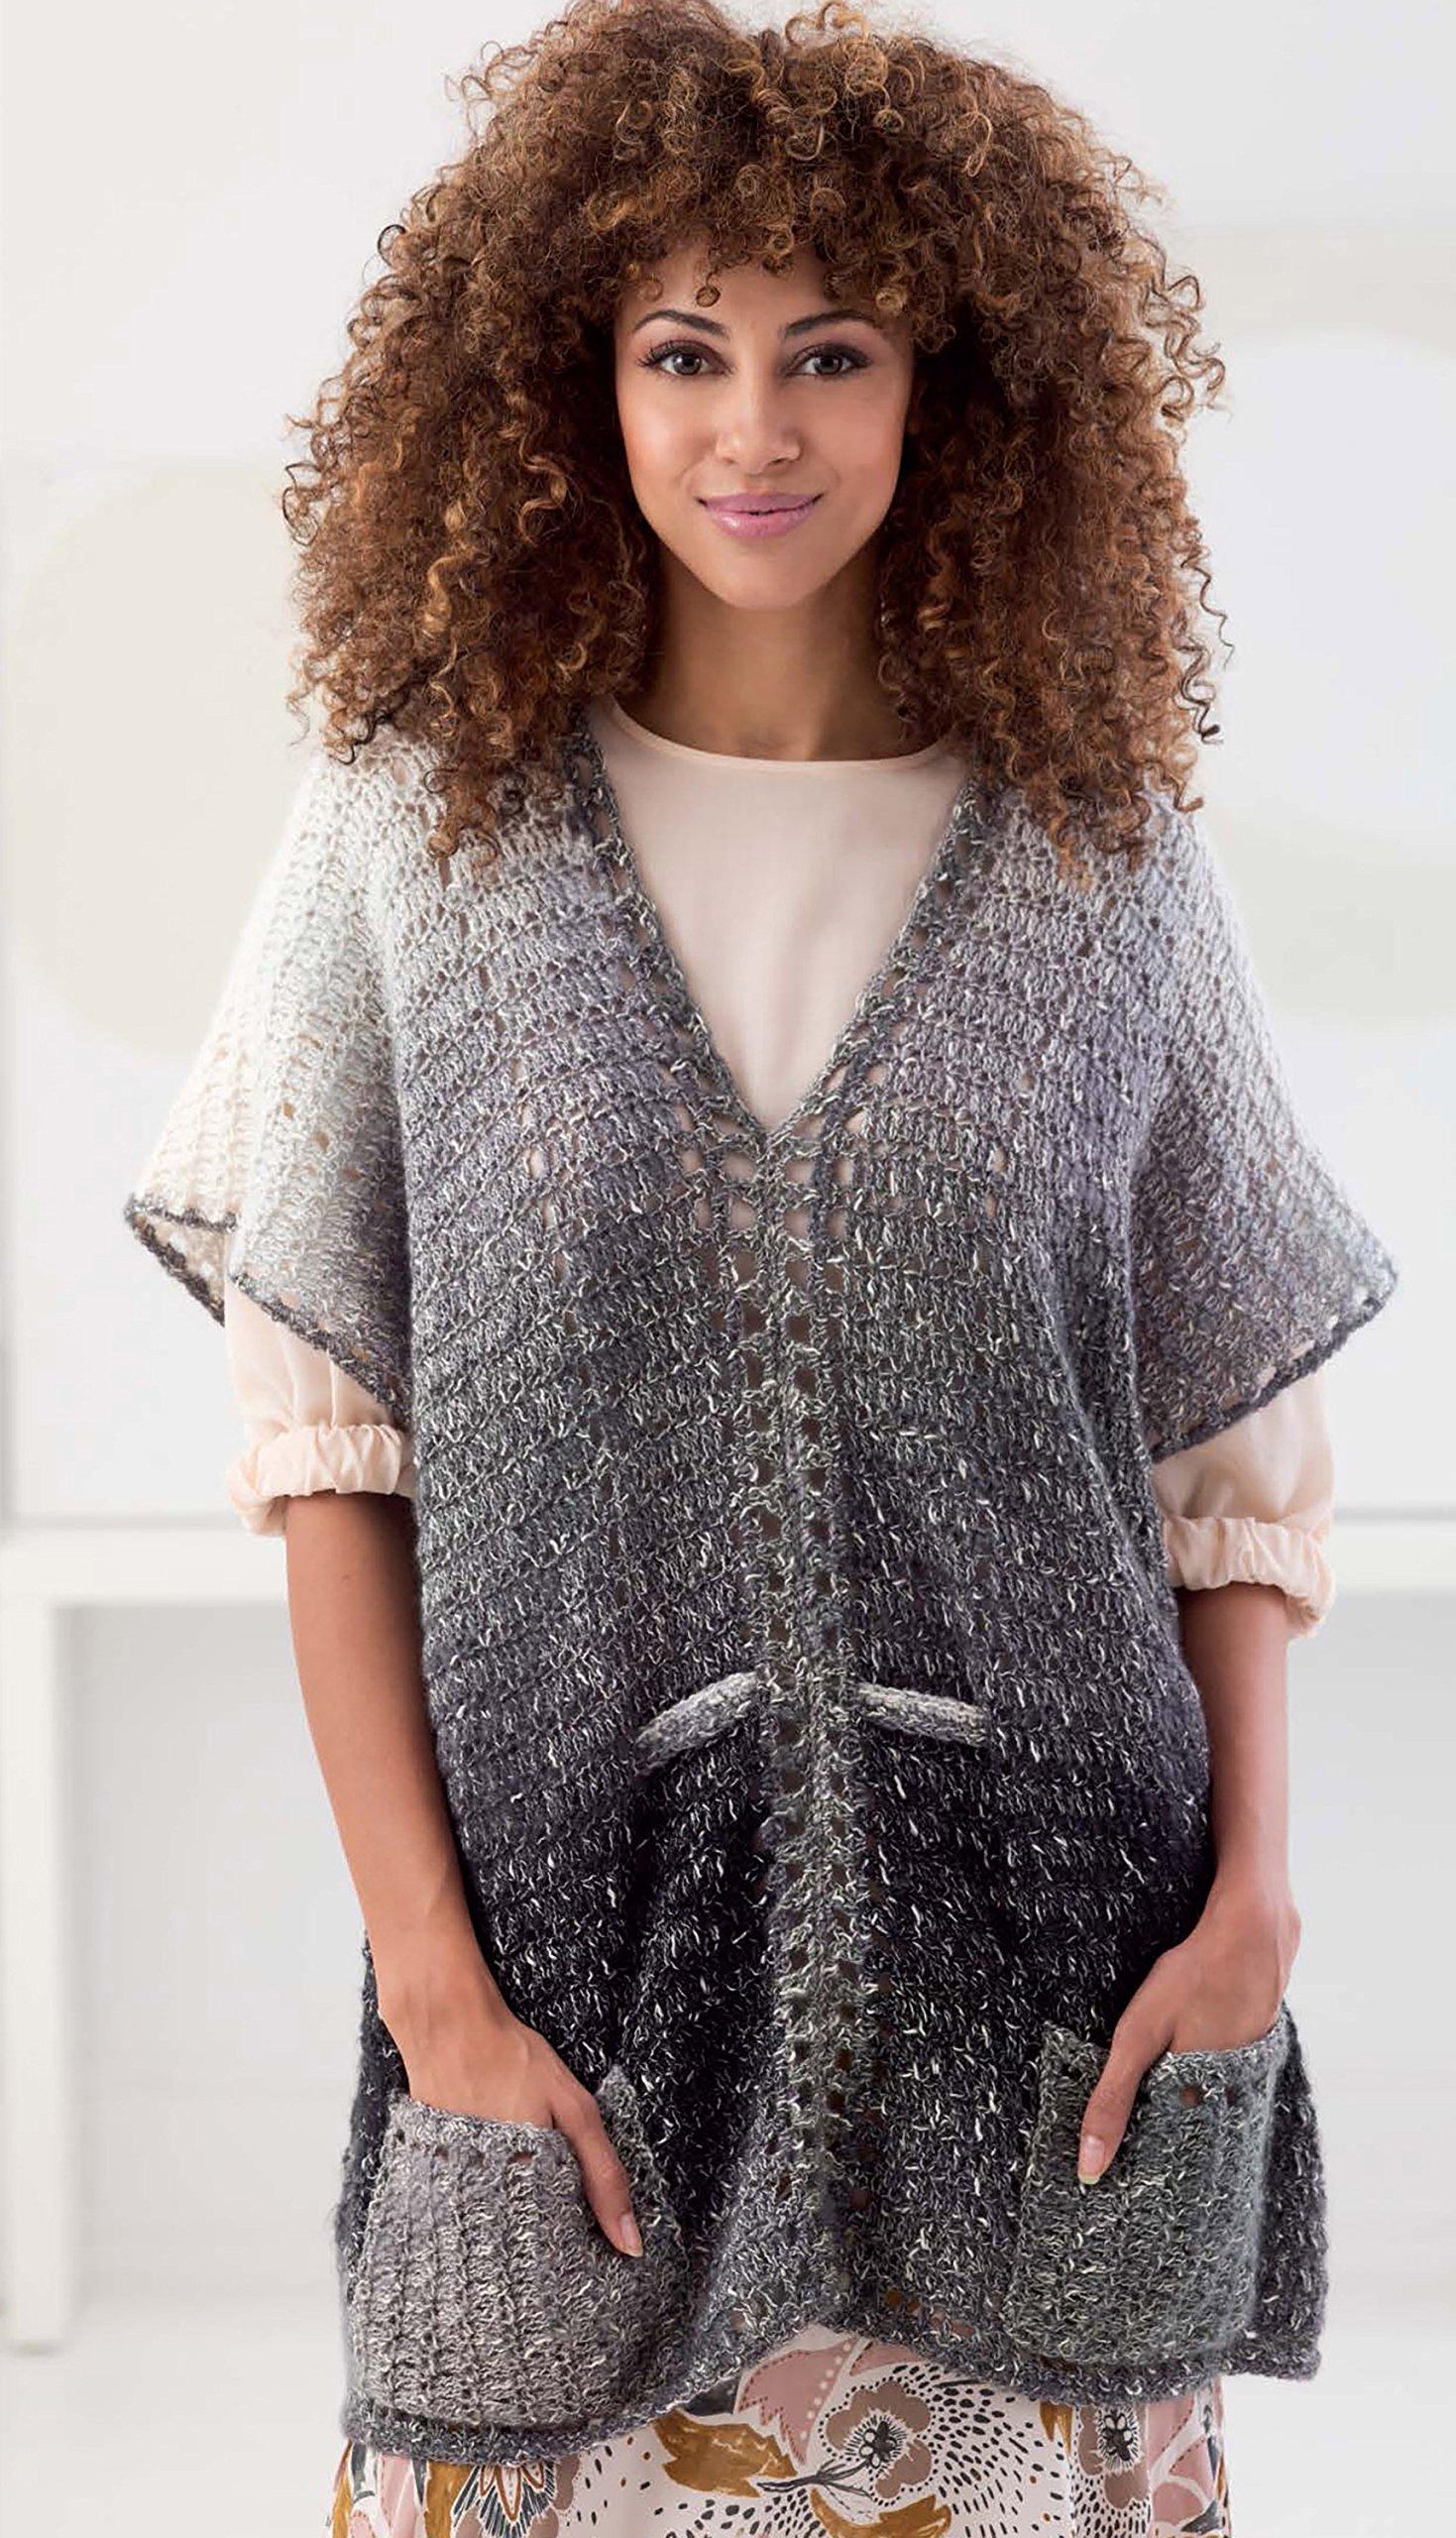 Shawls and Vests | Crochet | Leisure Arts (75607): Lion Brand Yarn:  9781464765834: Amazon.com: Books